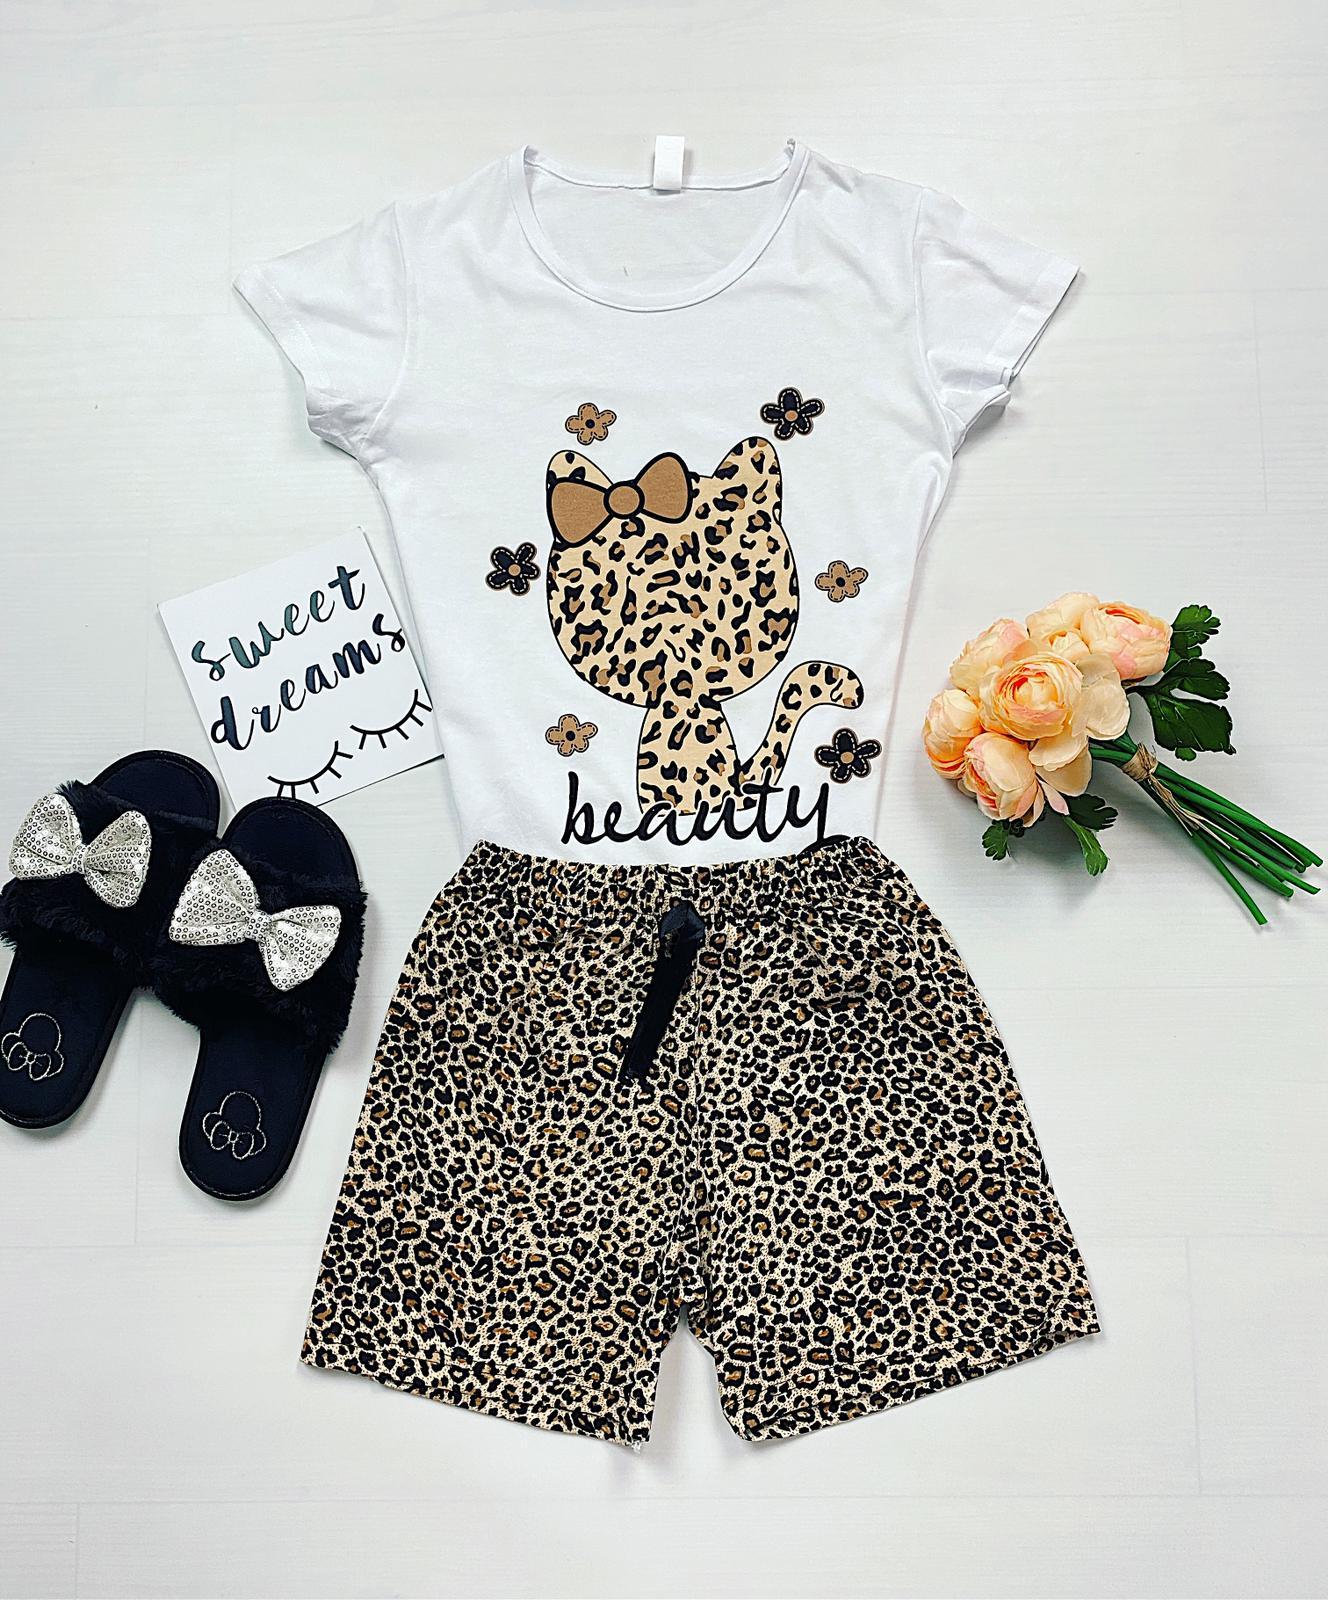 Pijama dama scurta cu imprimeu pisi animal print